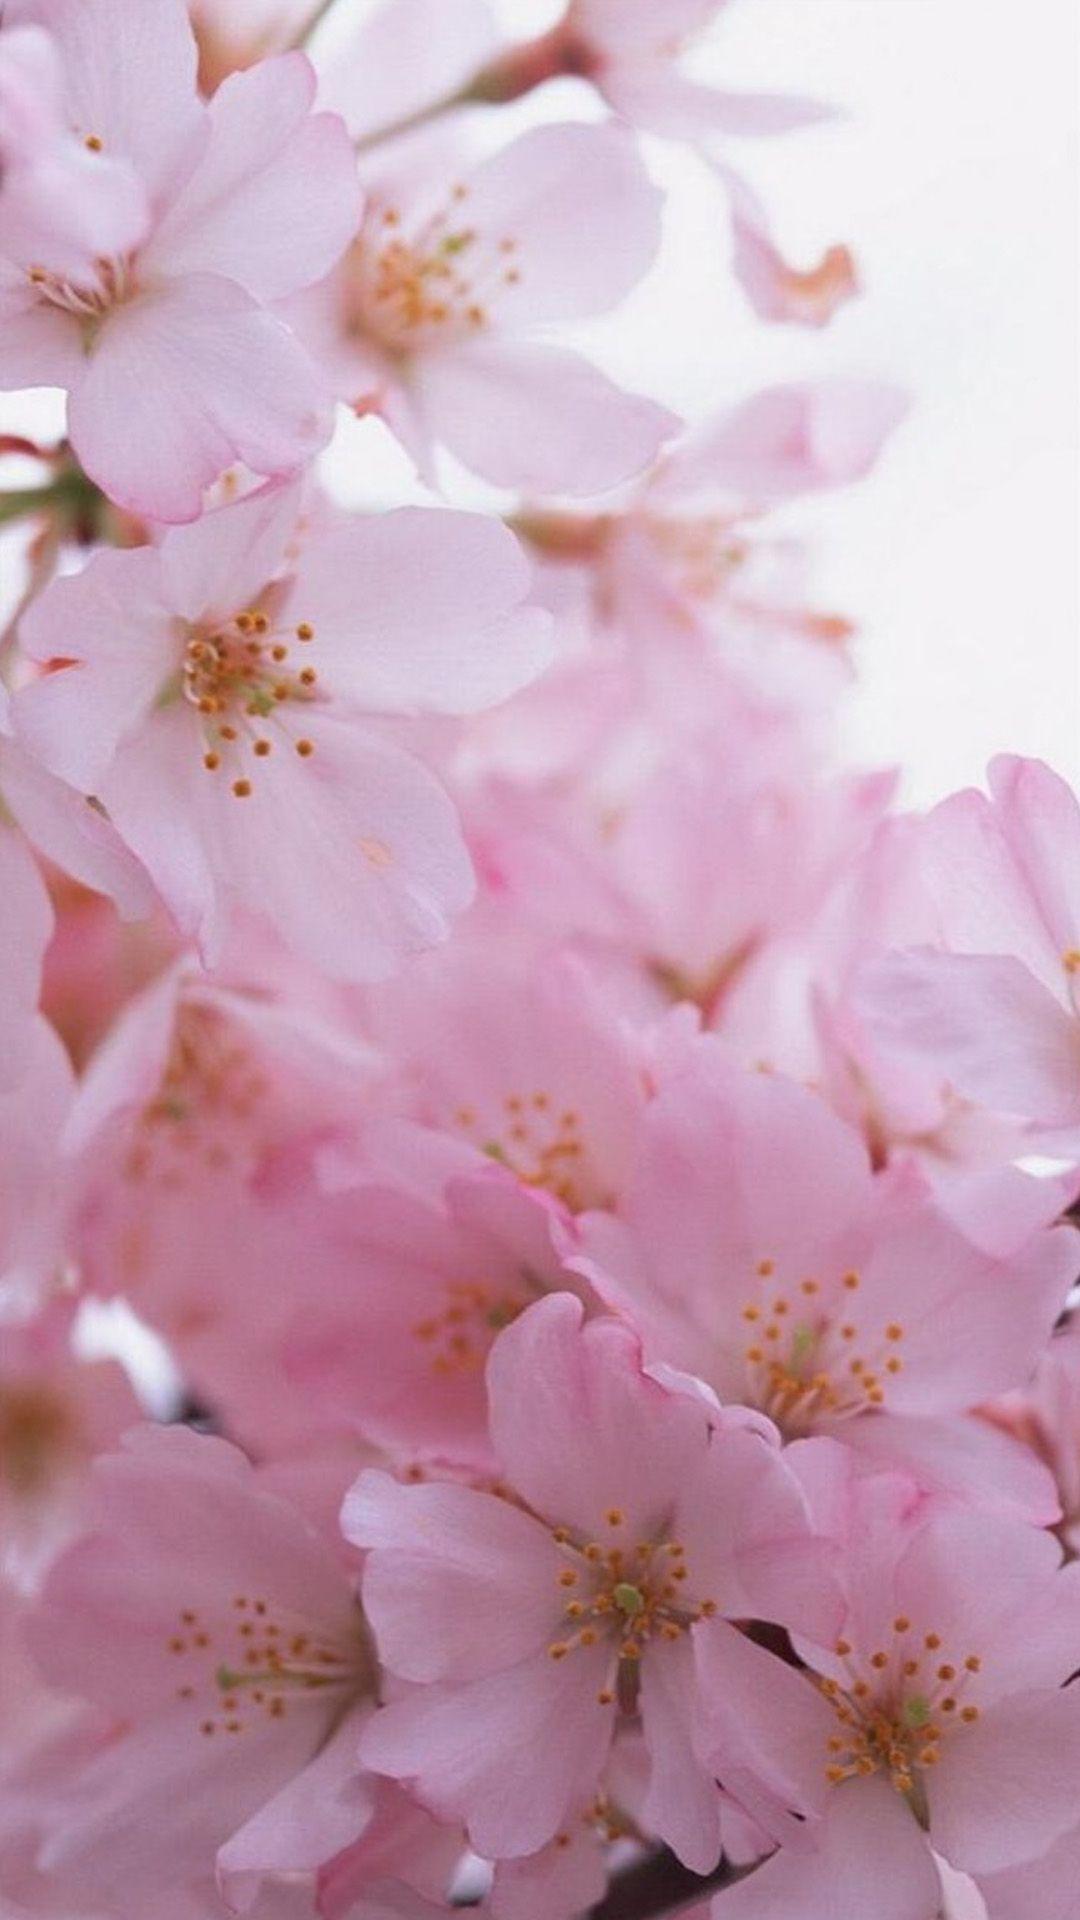 Pink Flower Bunch Macro iPhone 8 Wallpapers Весна цветение